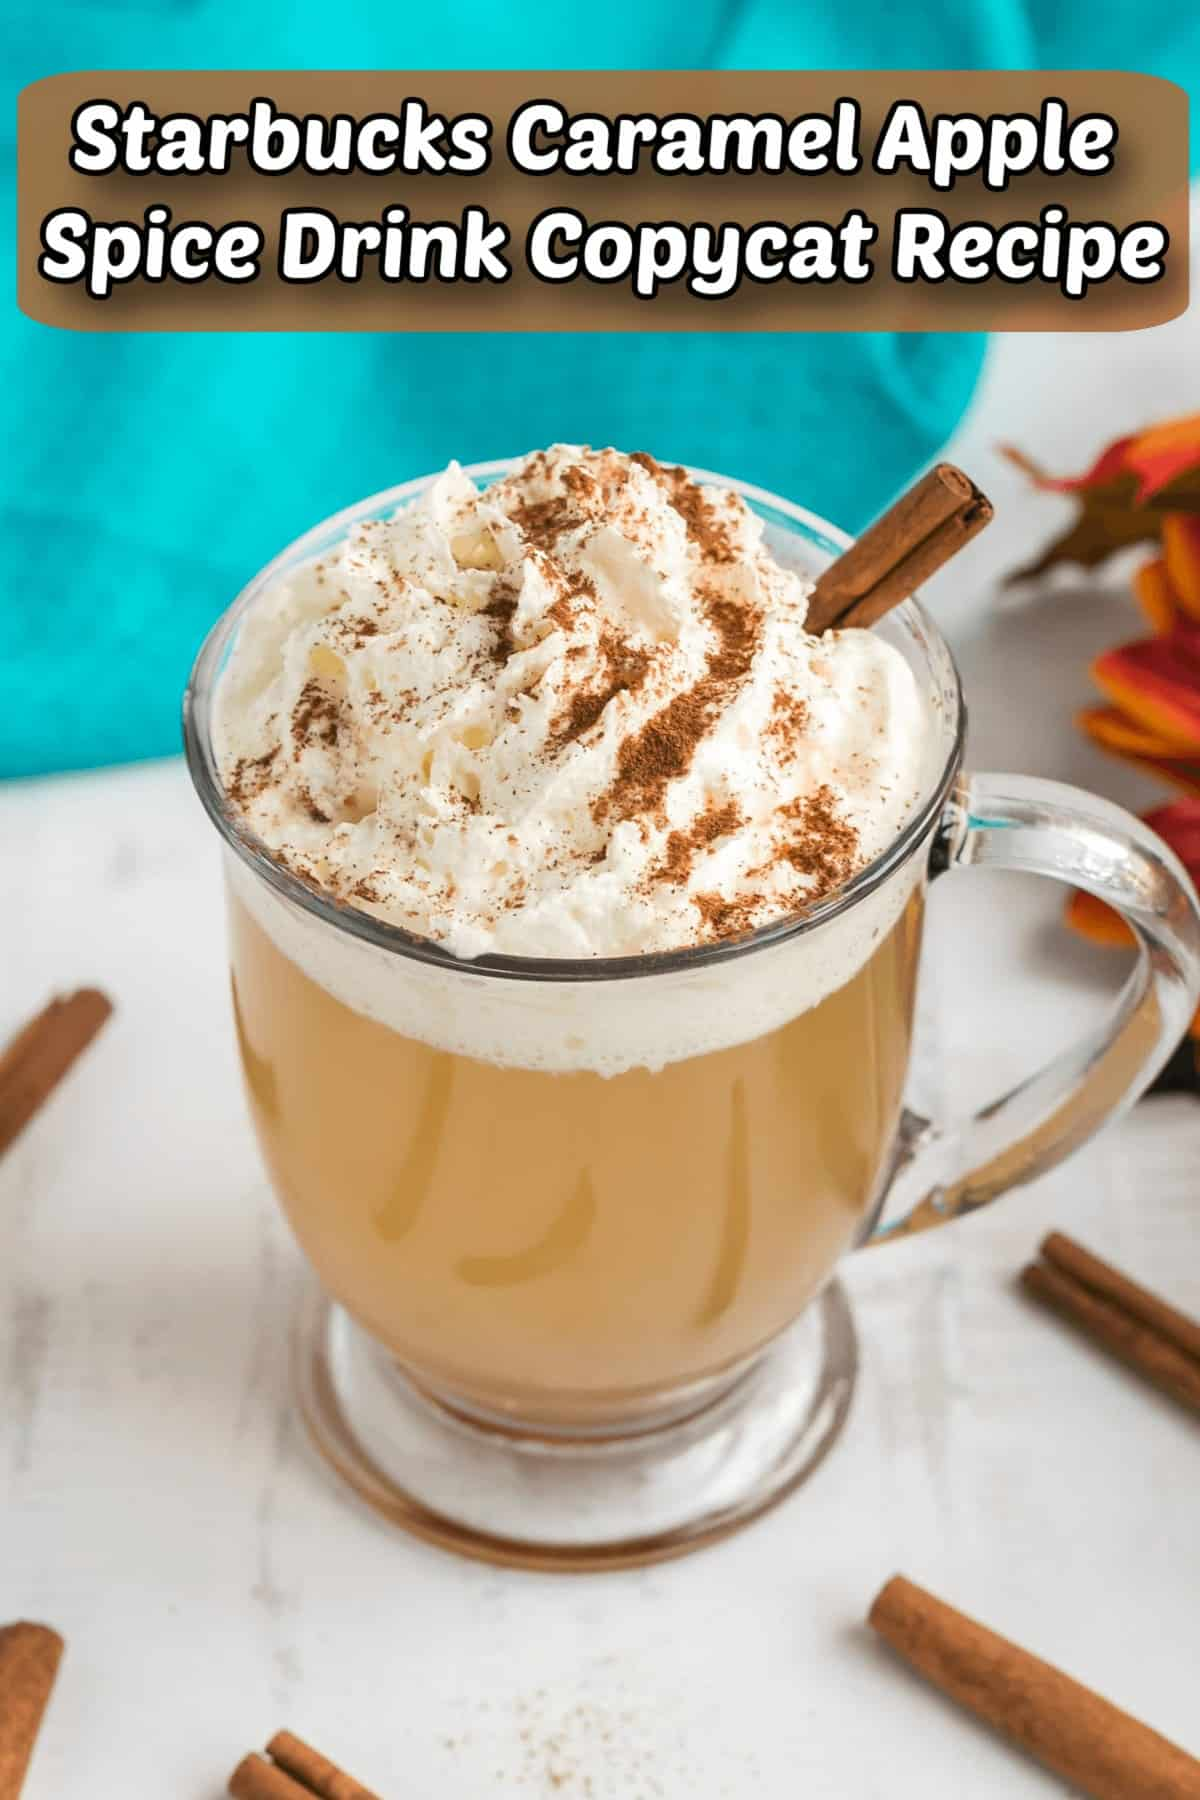 Starbucks Caramel Apple Spice Drink Copycat Recipe Pintrest Image